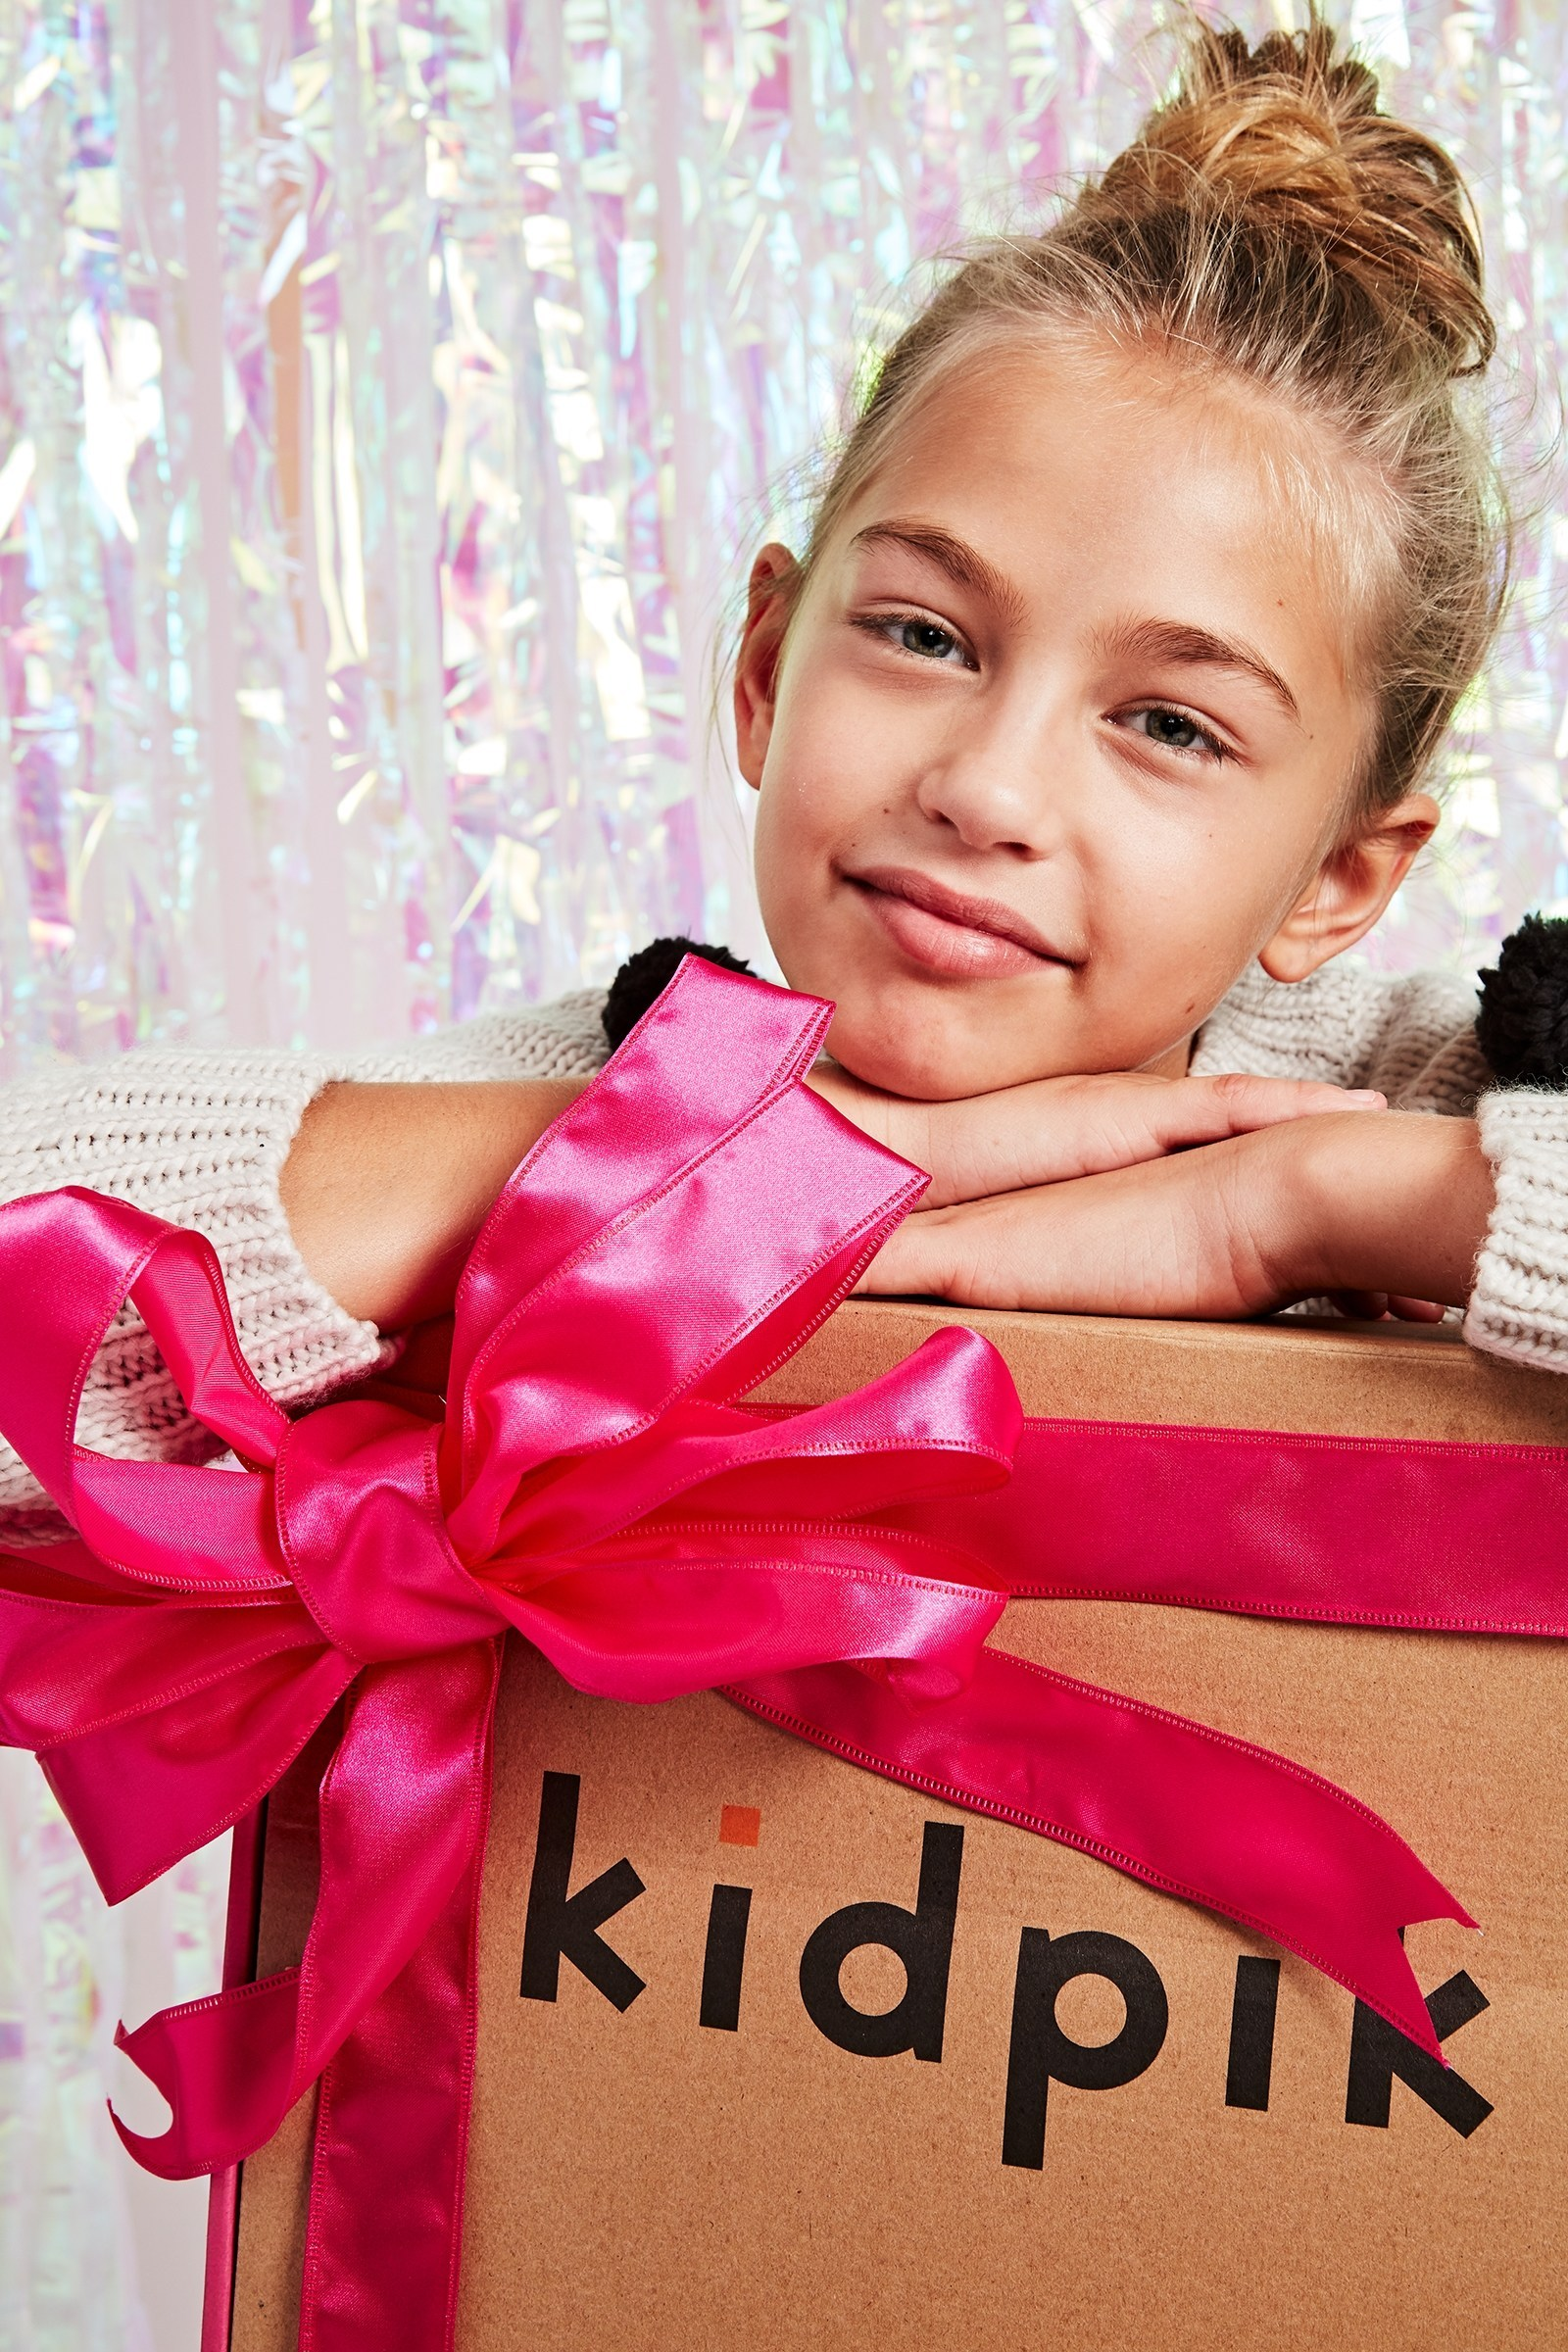 kidpik-holiday-fashion-box